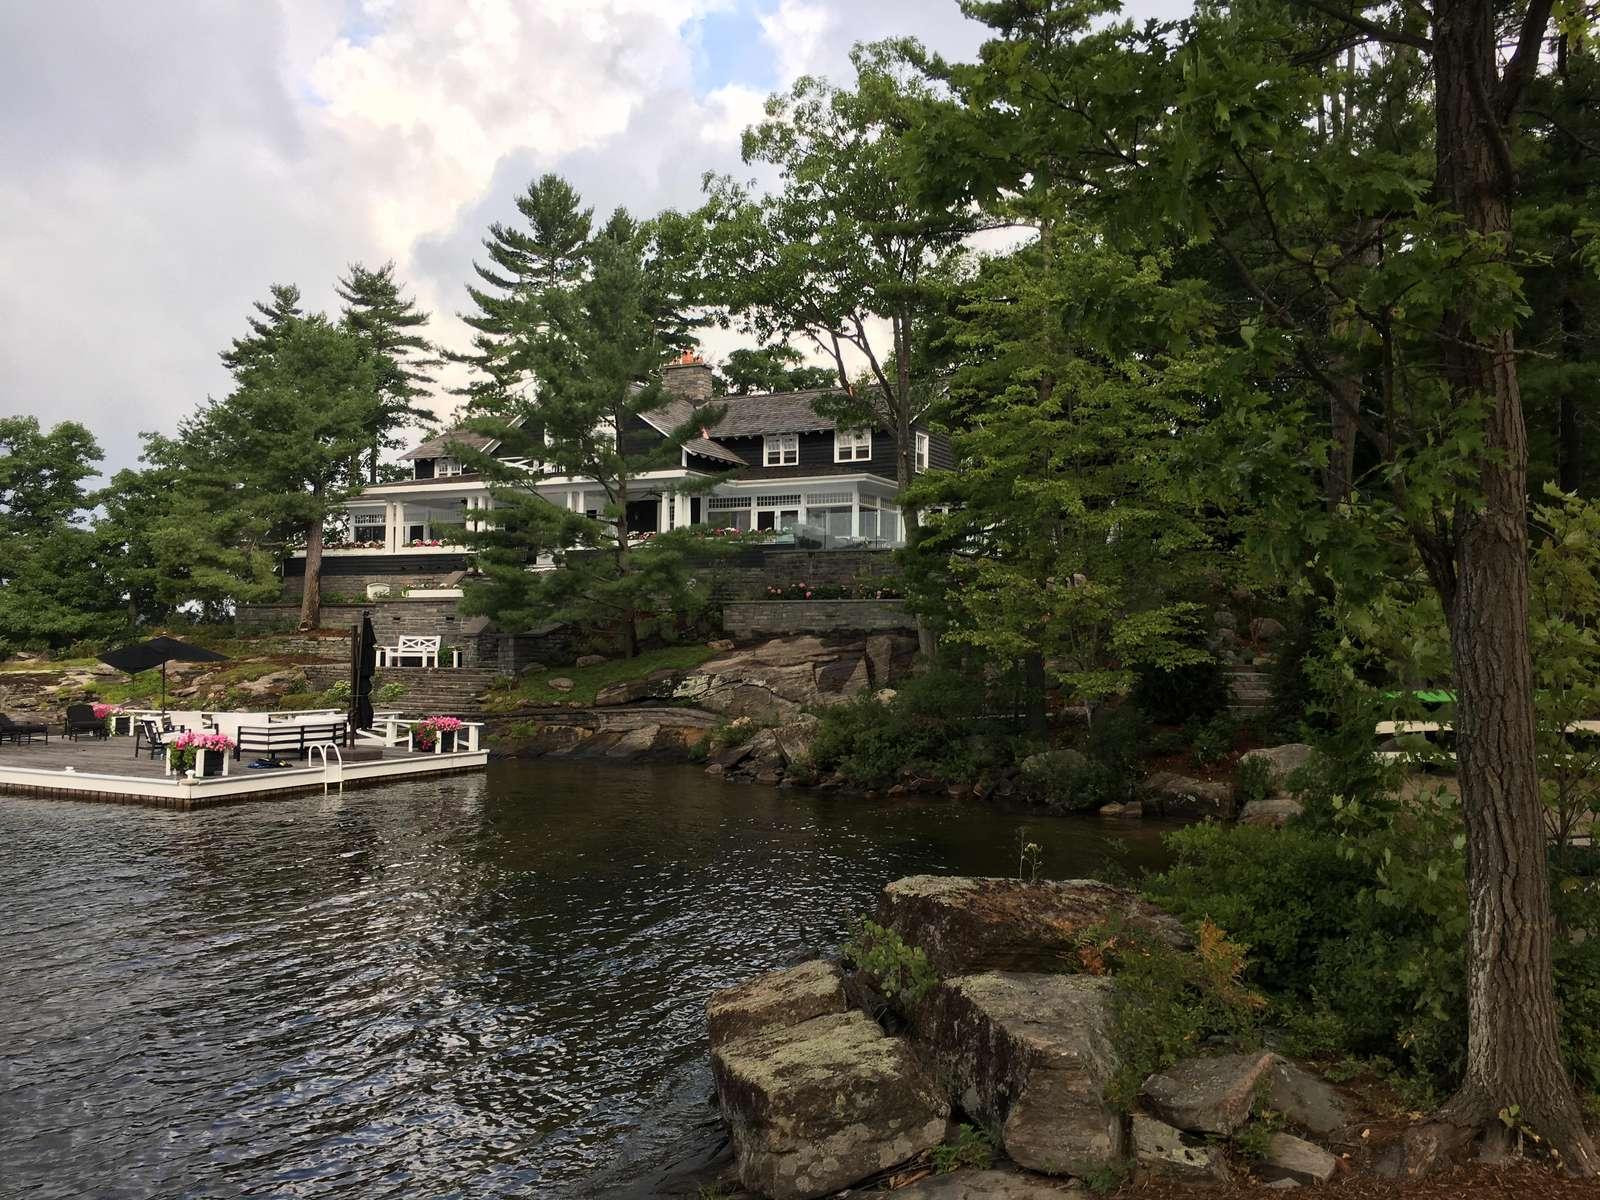 Main Dock/Main Cottage